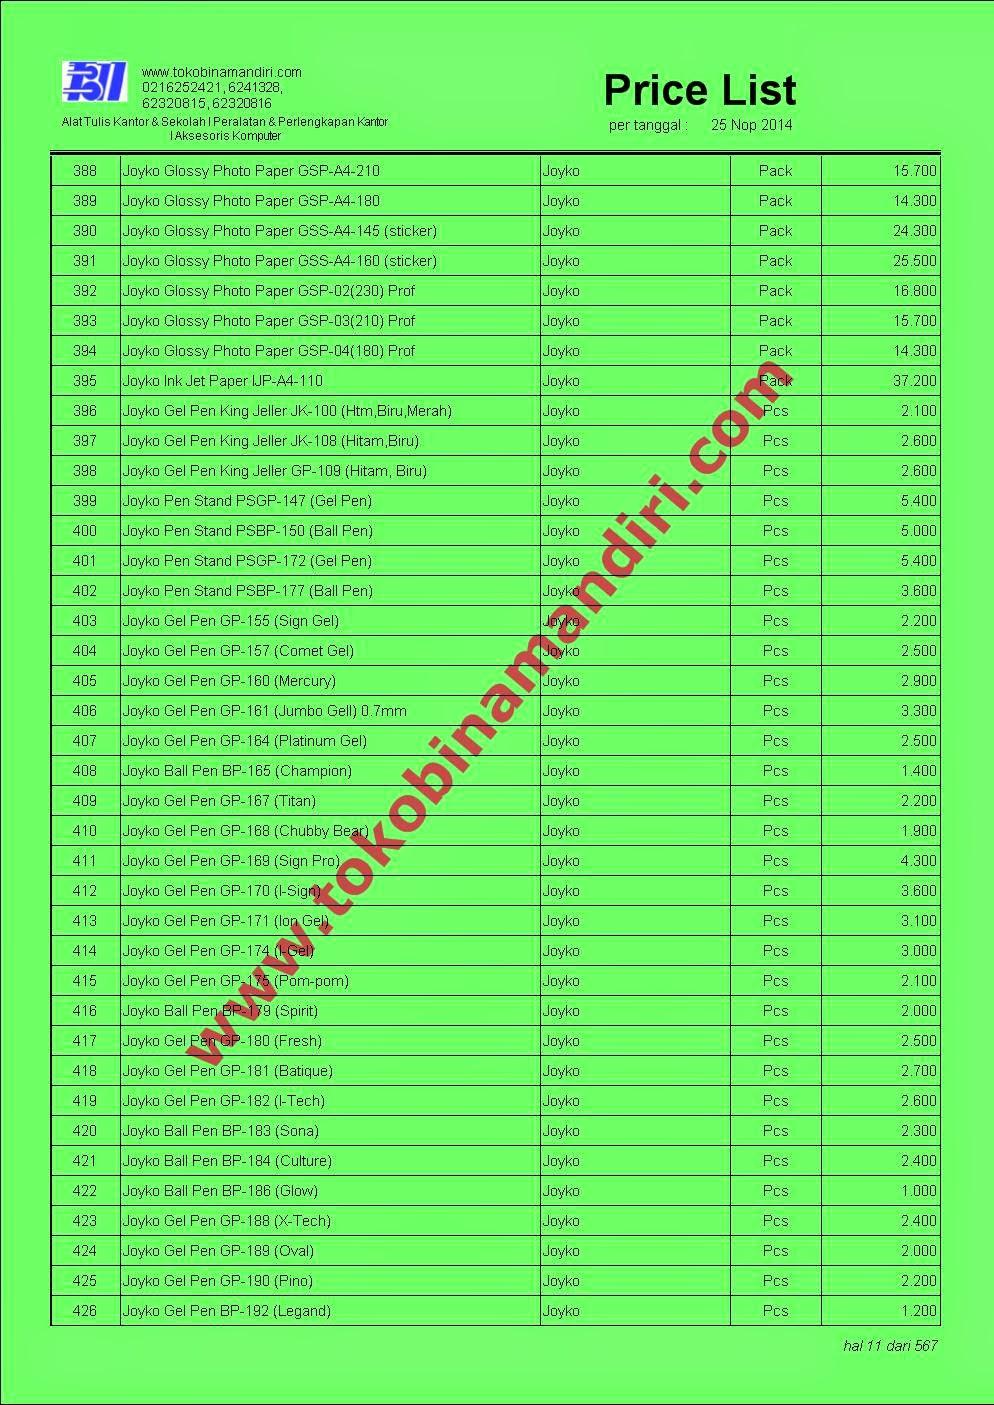 Daftar Harga Alat Tulis Kantor 2015 www.stationery.biz.id